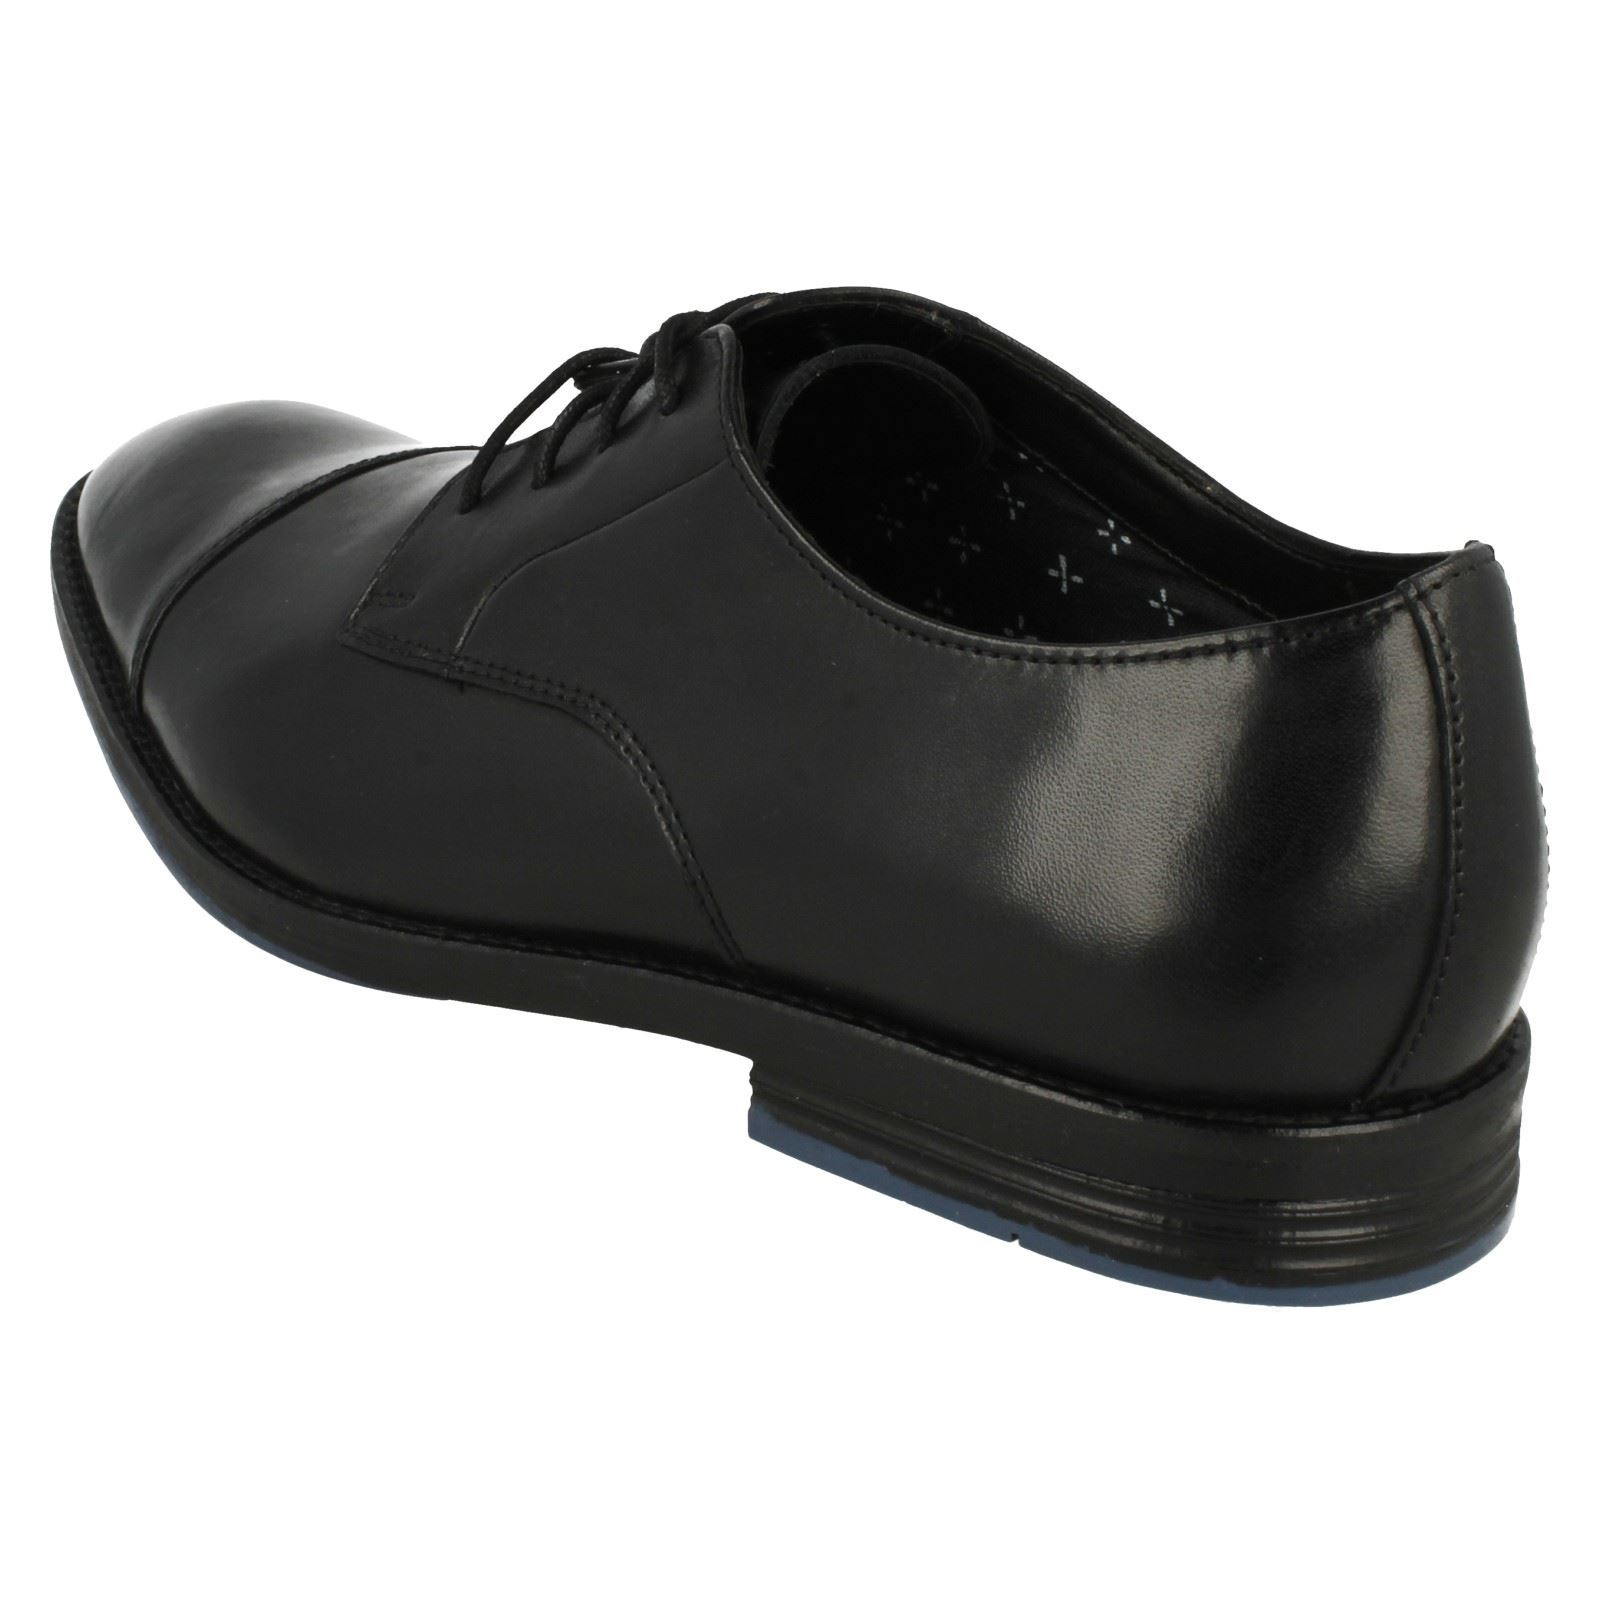 Black Clarks Leather Cap Prangley Up Shoes Formal Lace Men's Toe Oxford BtQodxCsrh